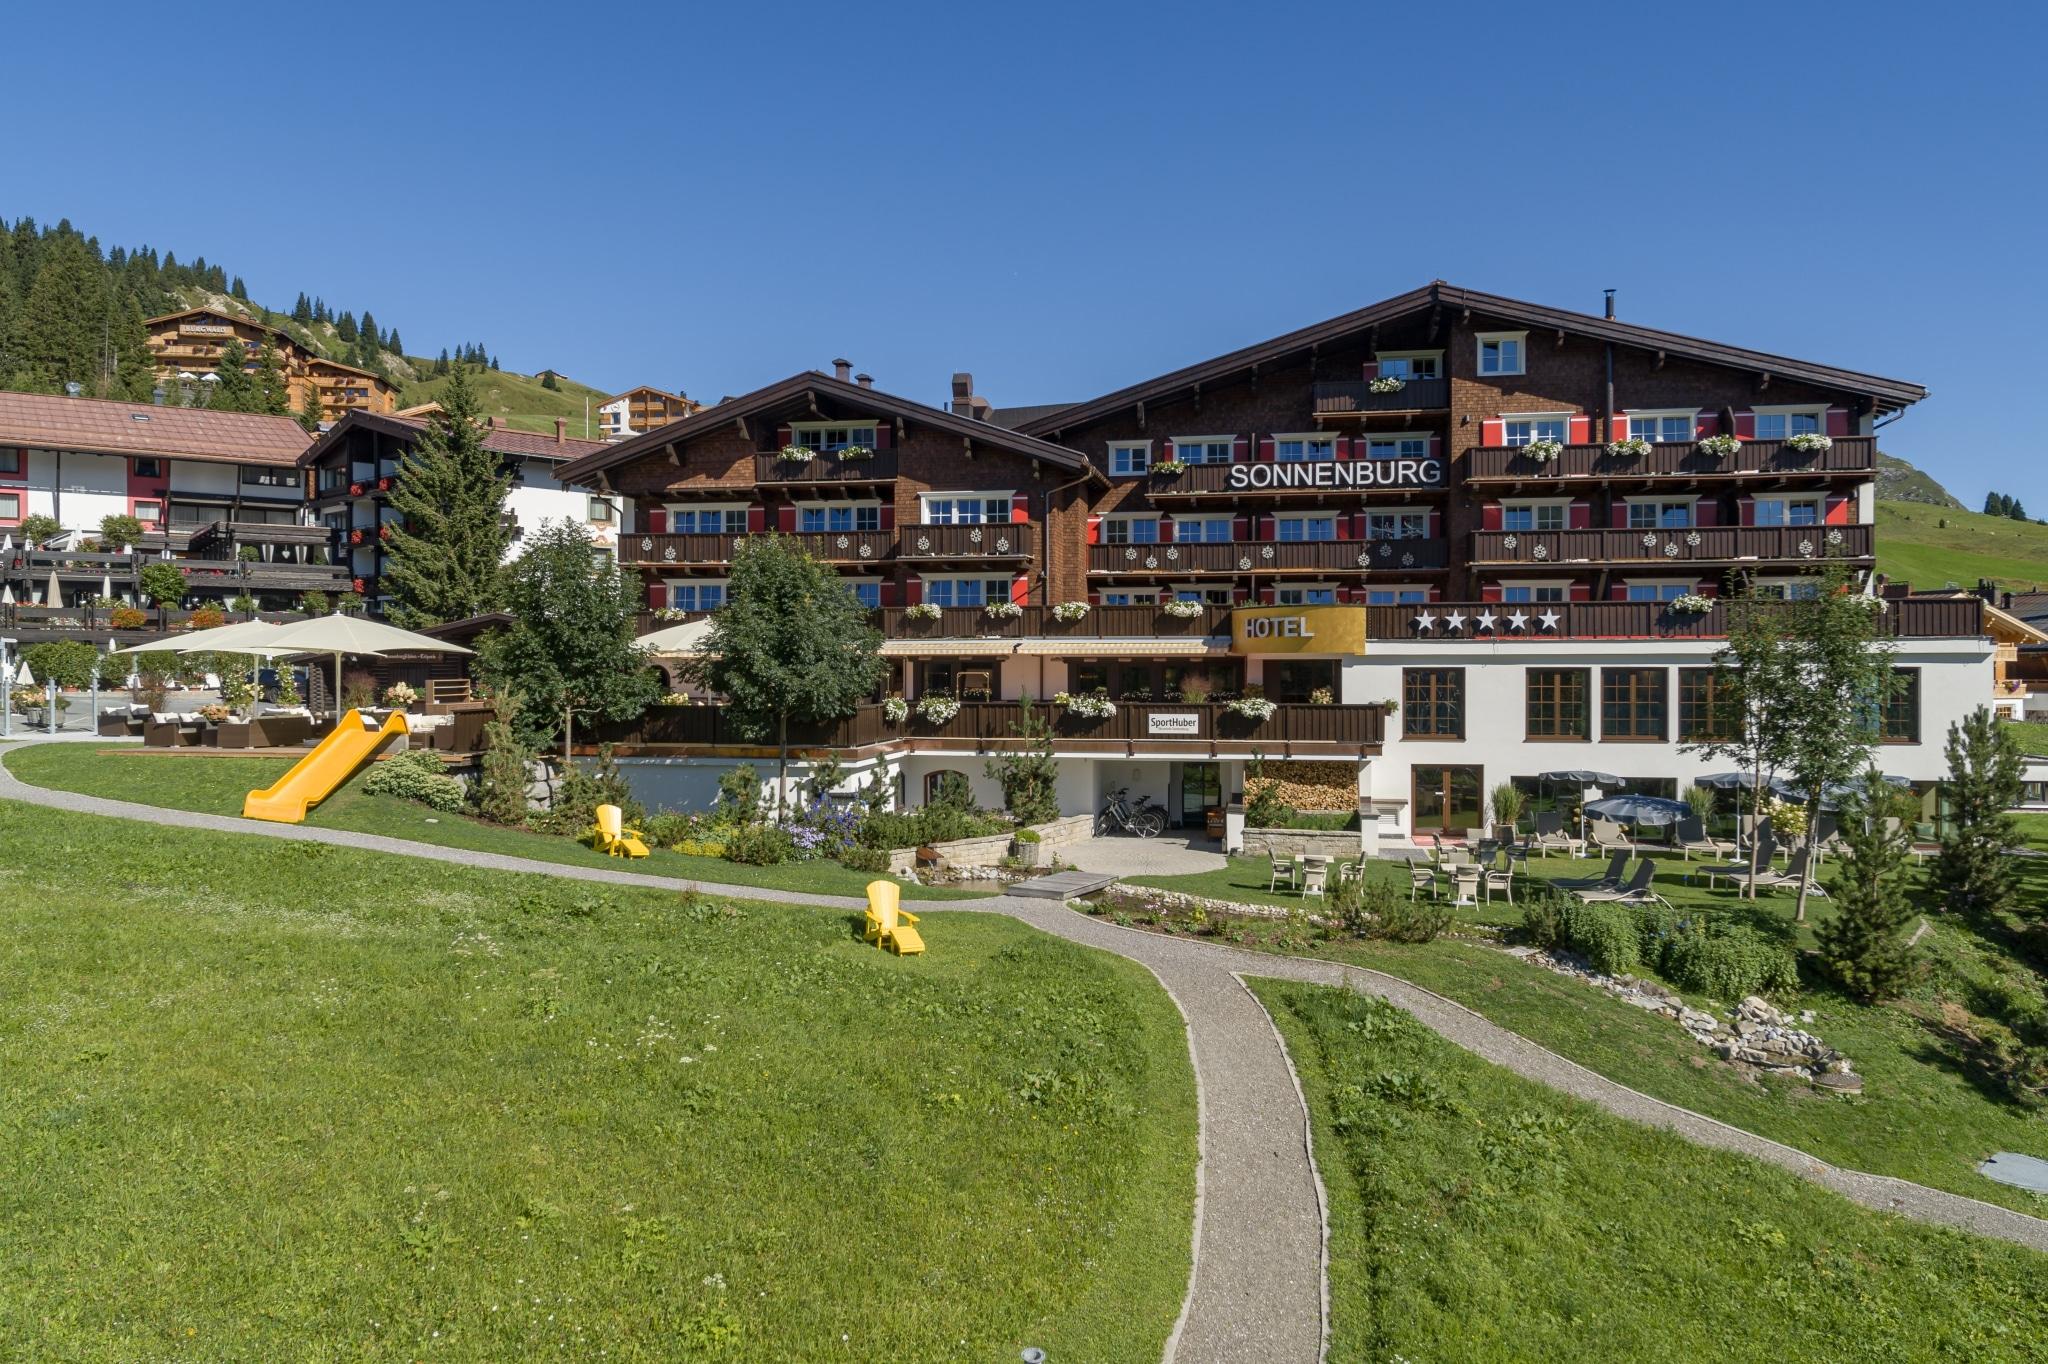 Sonnenburg Wanderhotel in Oberlech am Arlberg